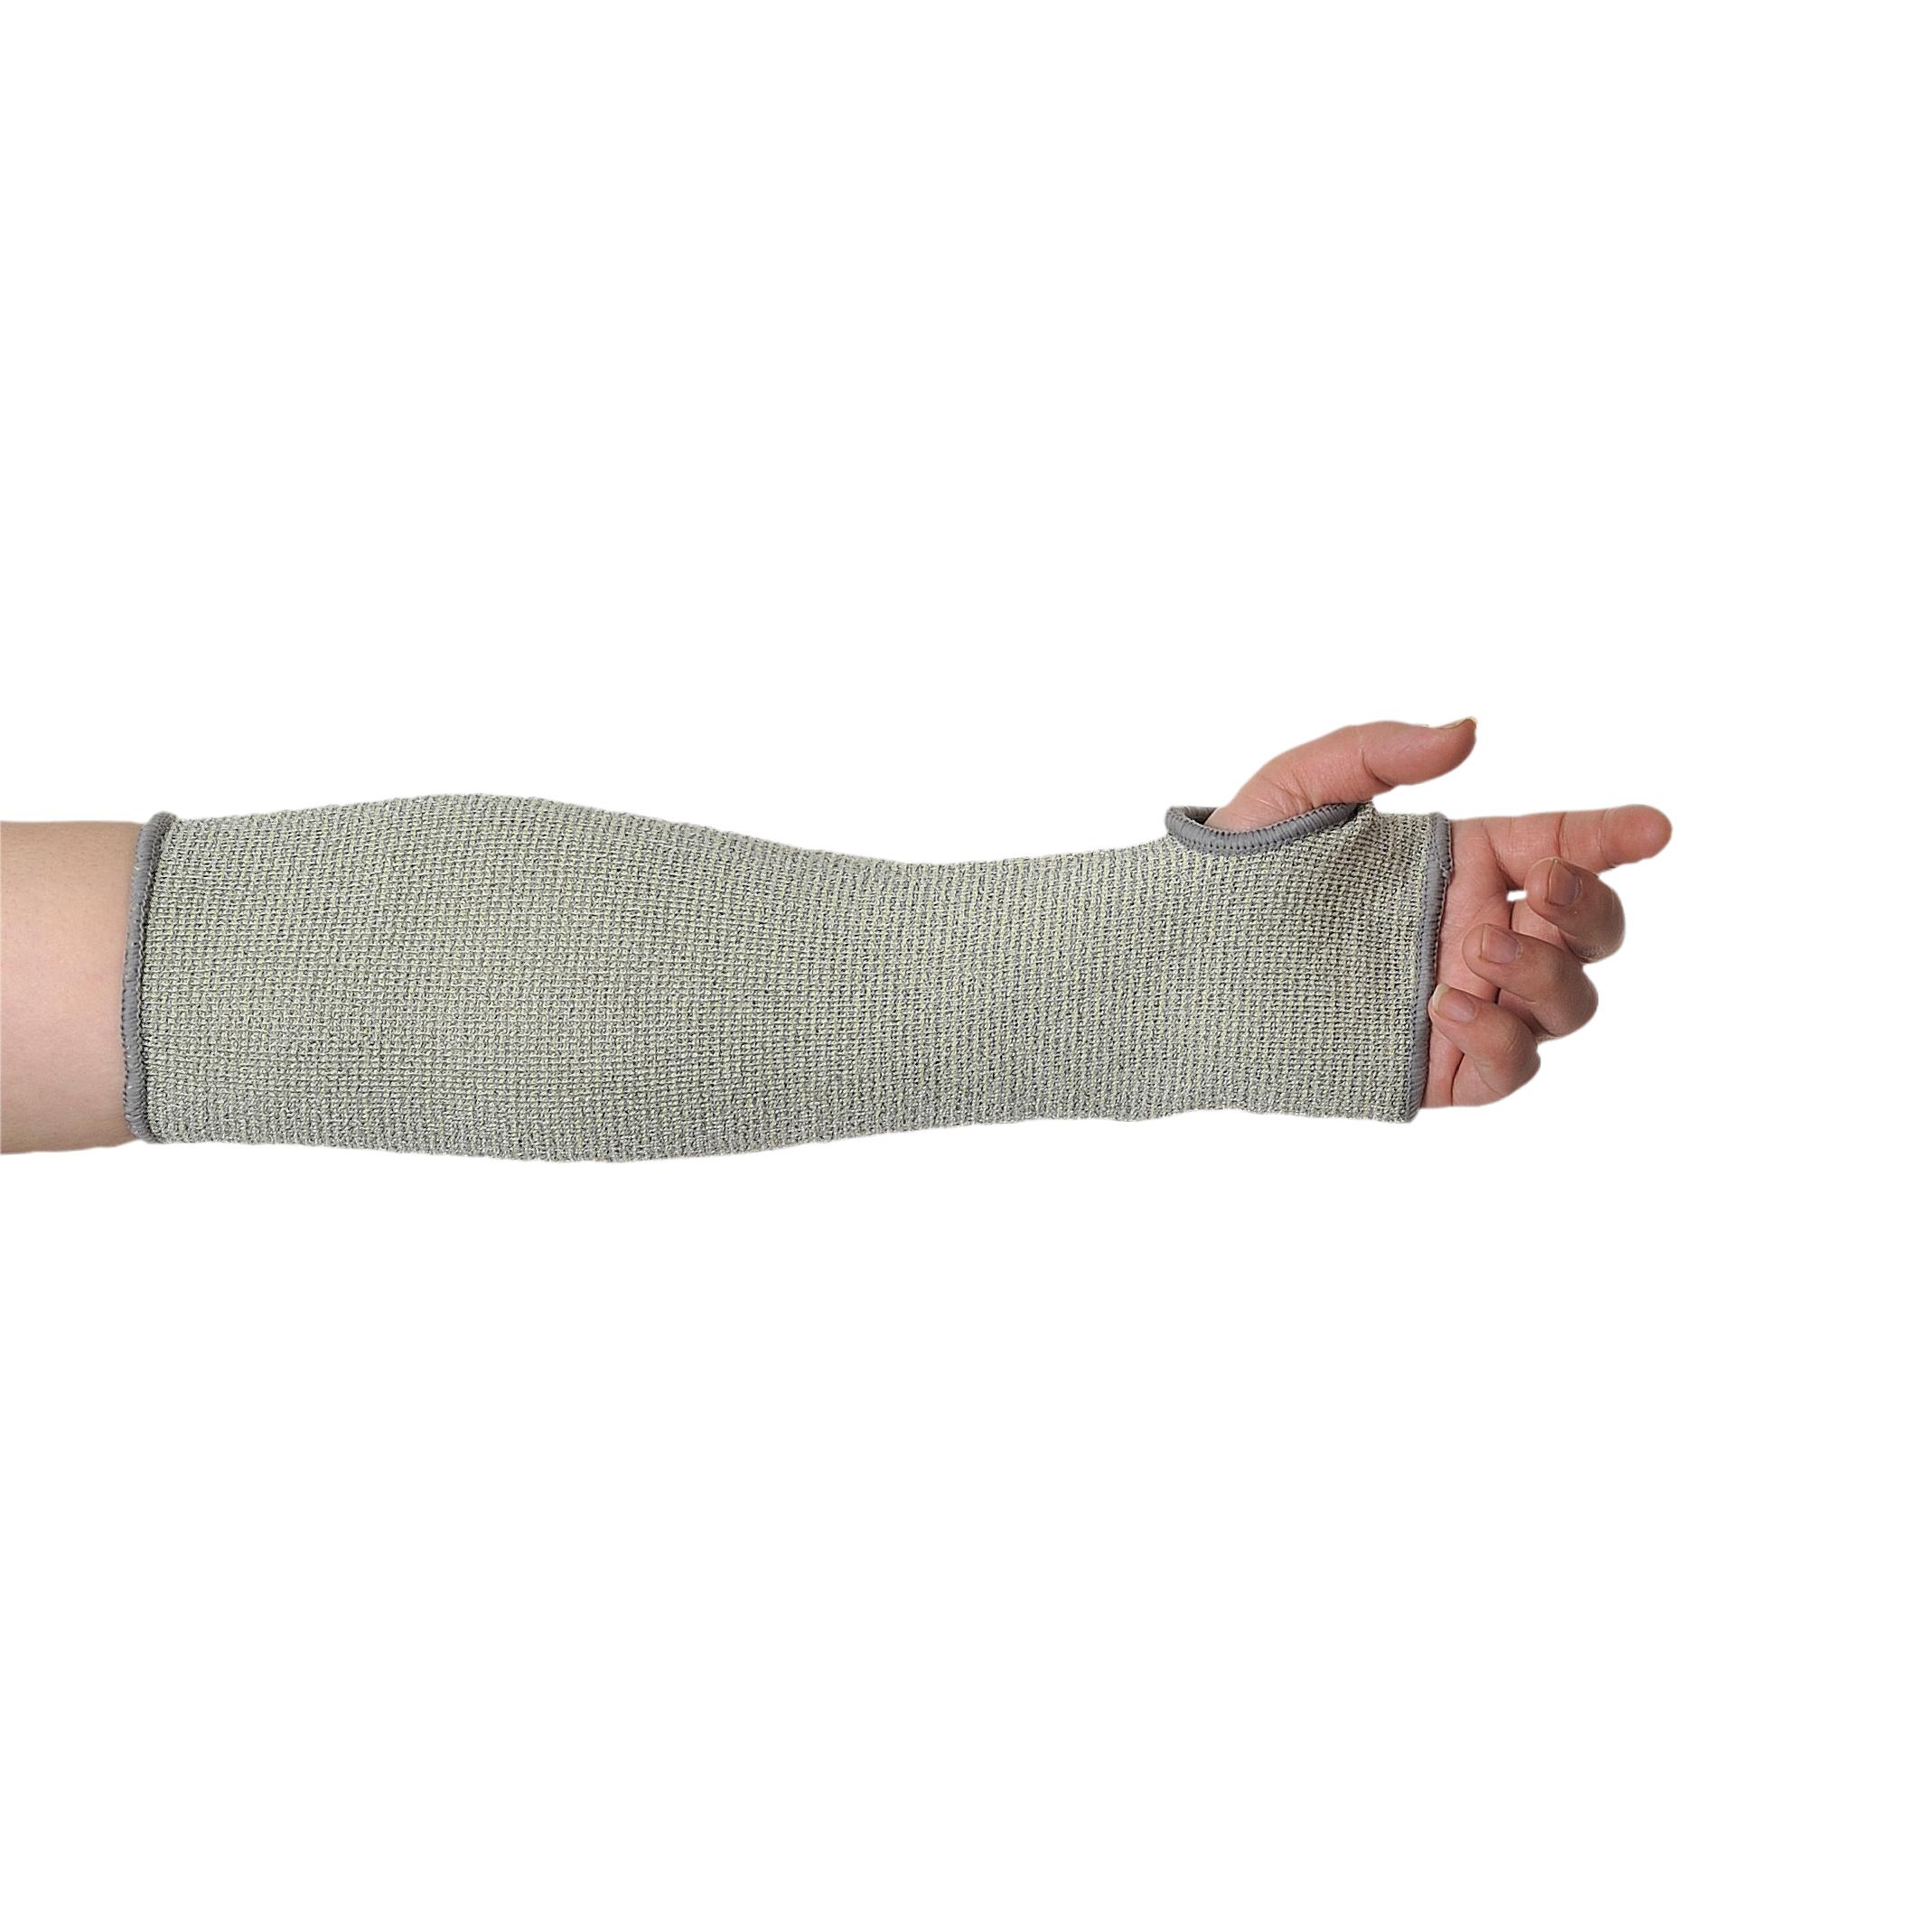 Portwest 14 inch (35cm) Cut Resistant Sleeve - A689